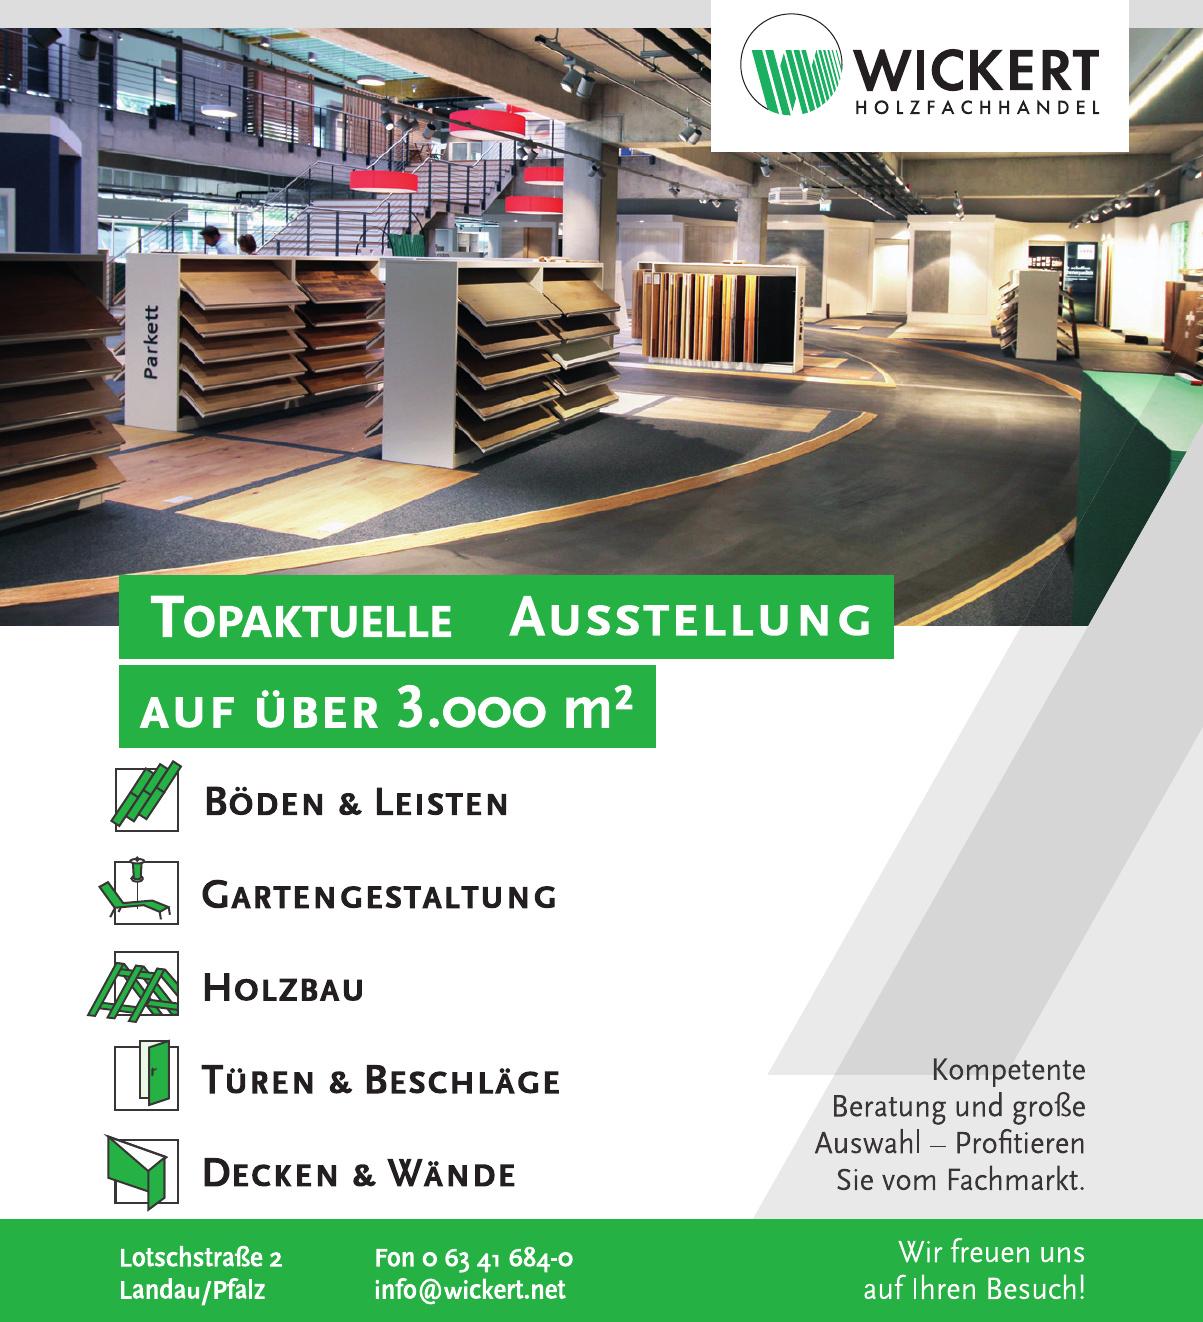 Wickert Holzfachhandel